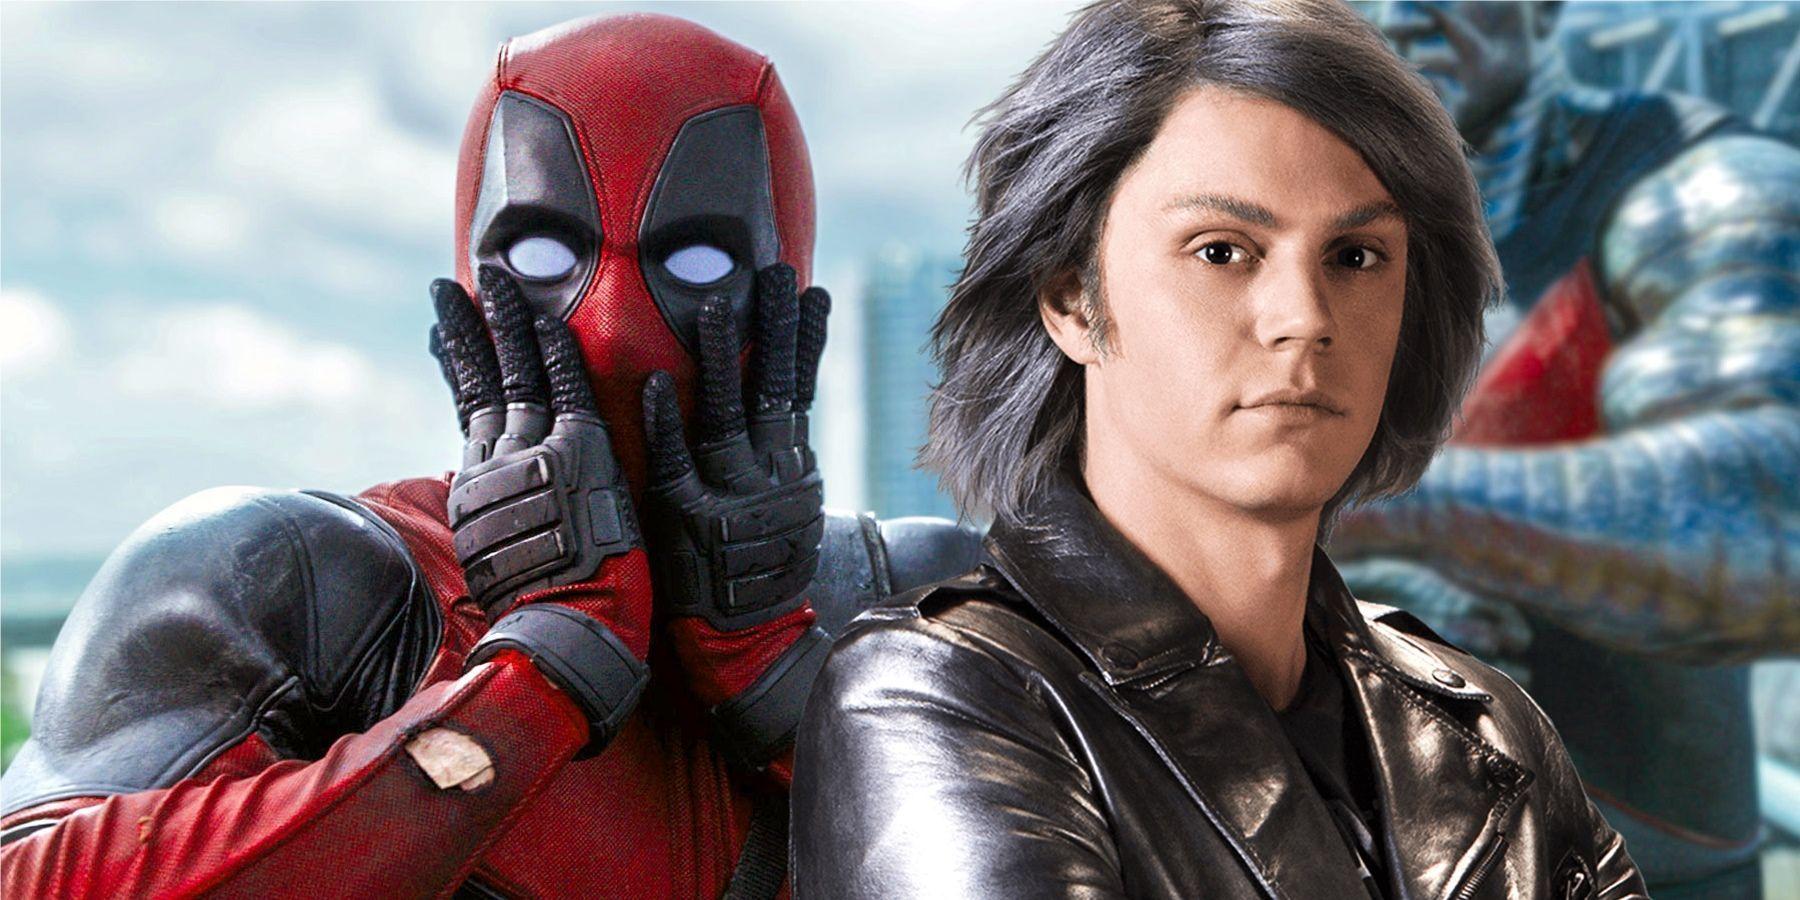 X-Men's Quicksilver Wants a Deadpool Team-Up Movie ...